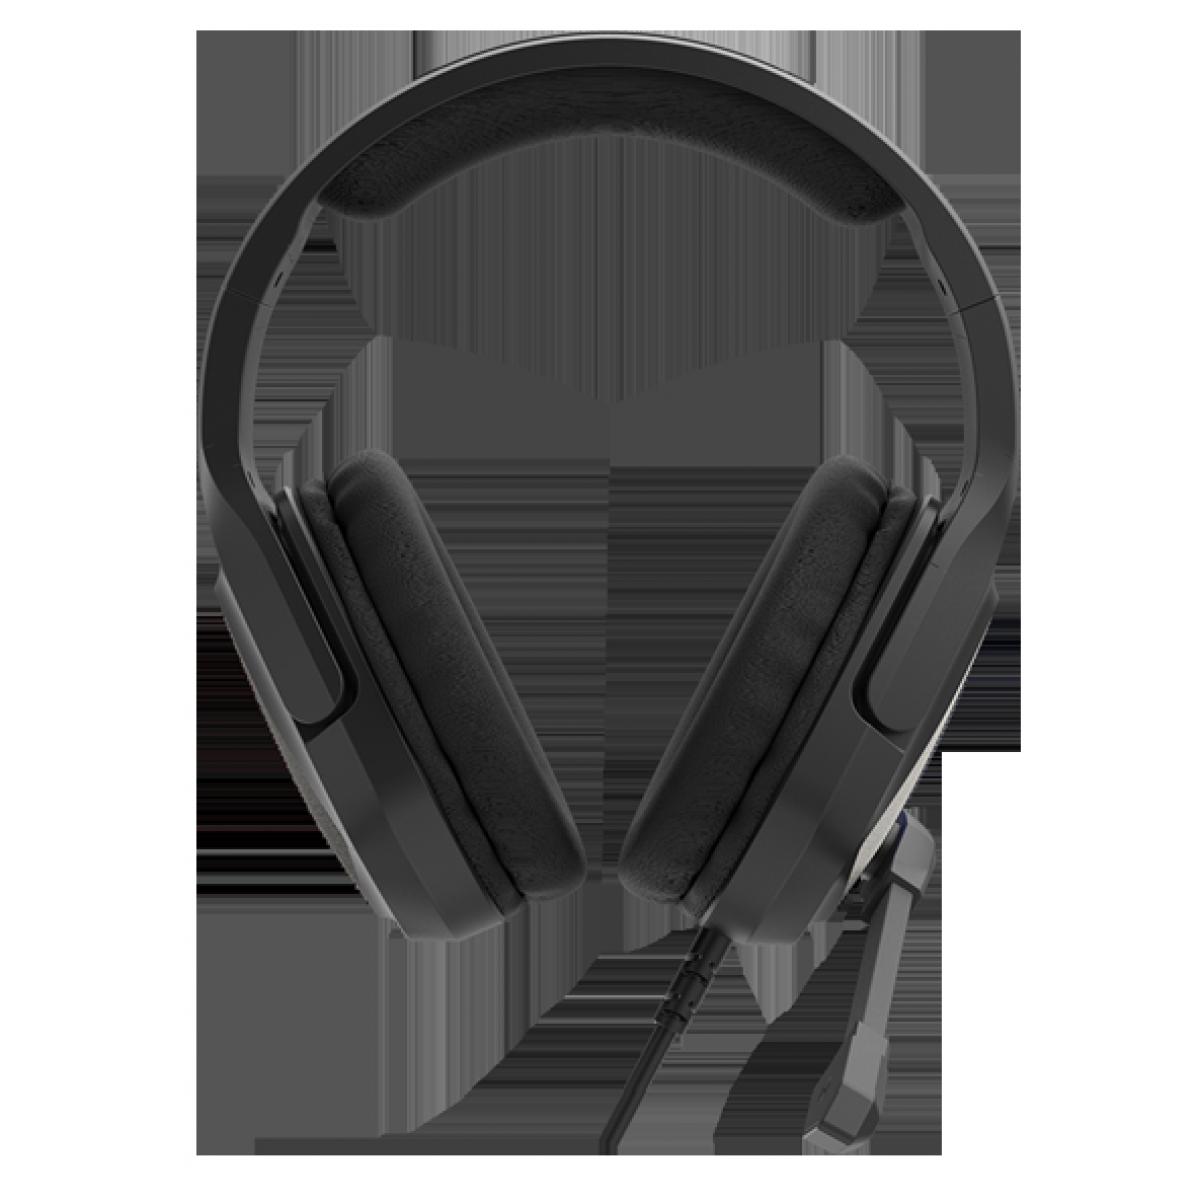 Headset Gamer Fantech Jade, 3.5mm + USB, RGB, Black, MH84